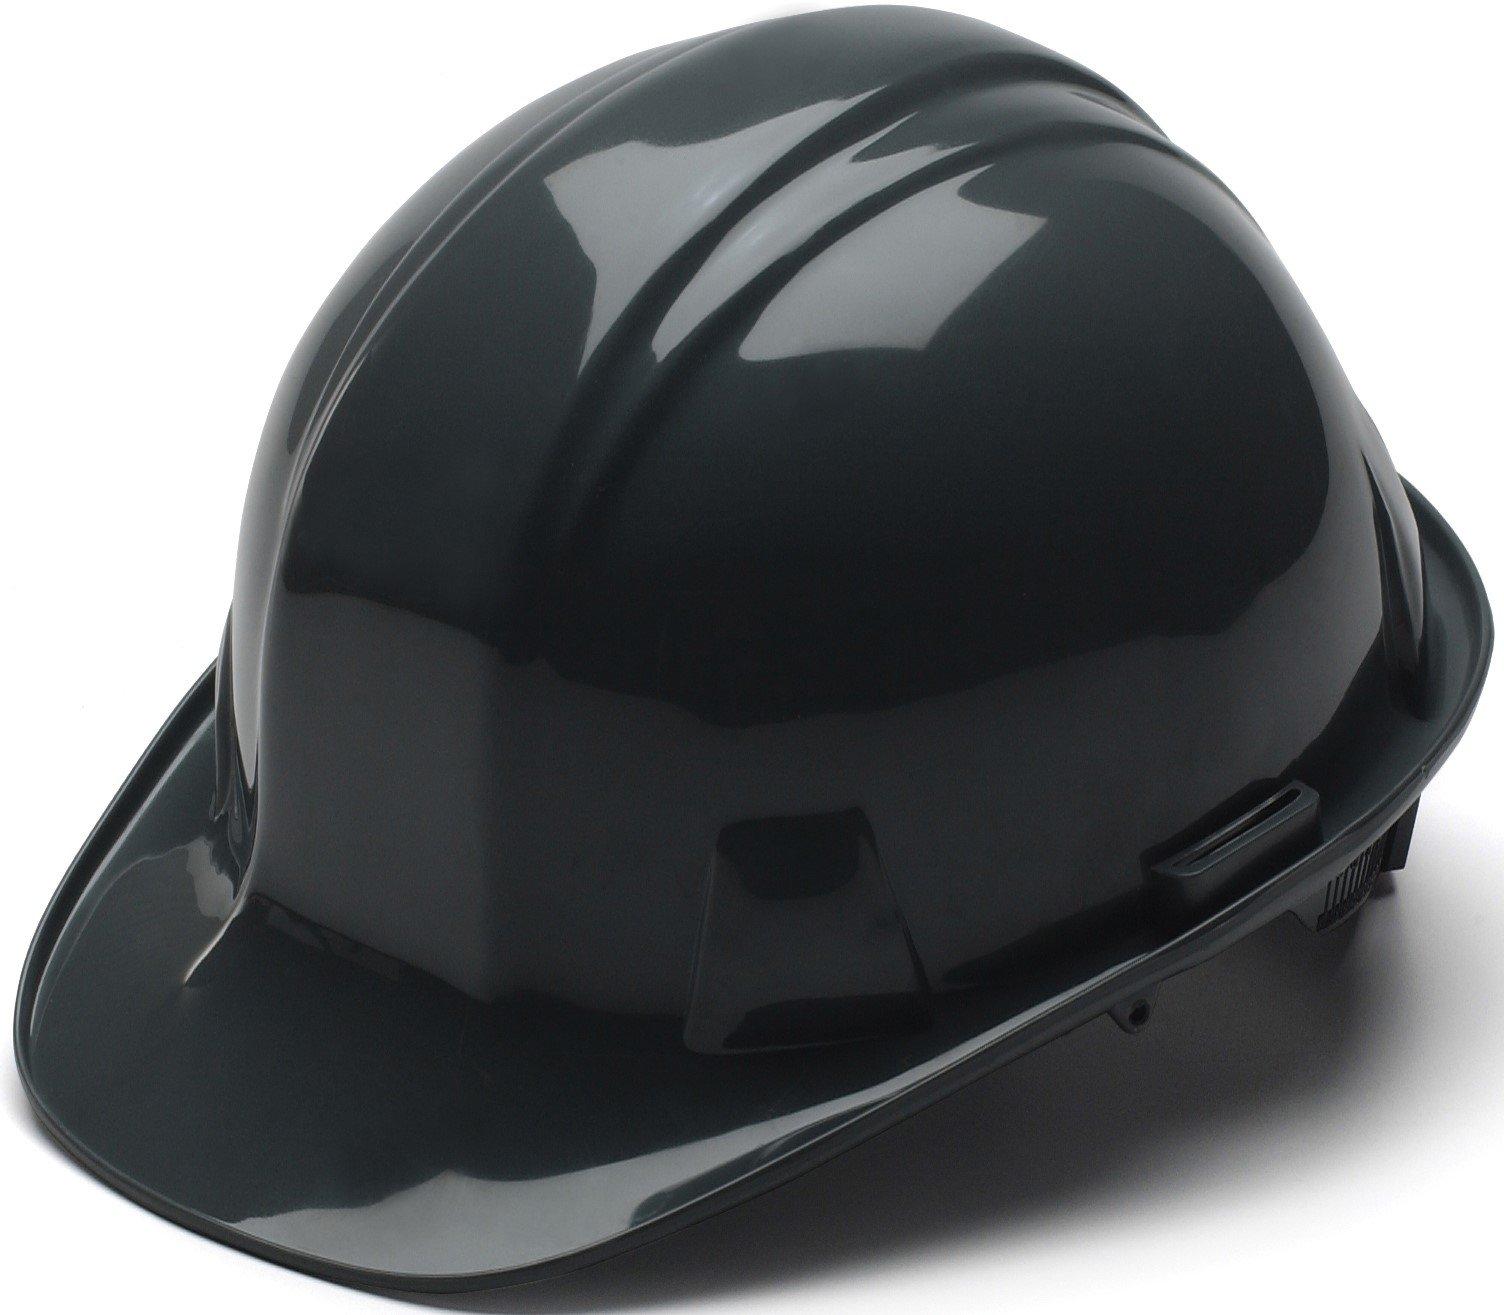 Pyramex Standard Shell Ratchet Suspension Hard Hat, 4 Point Ratchet Suspension, Black